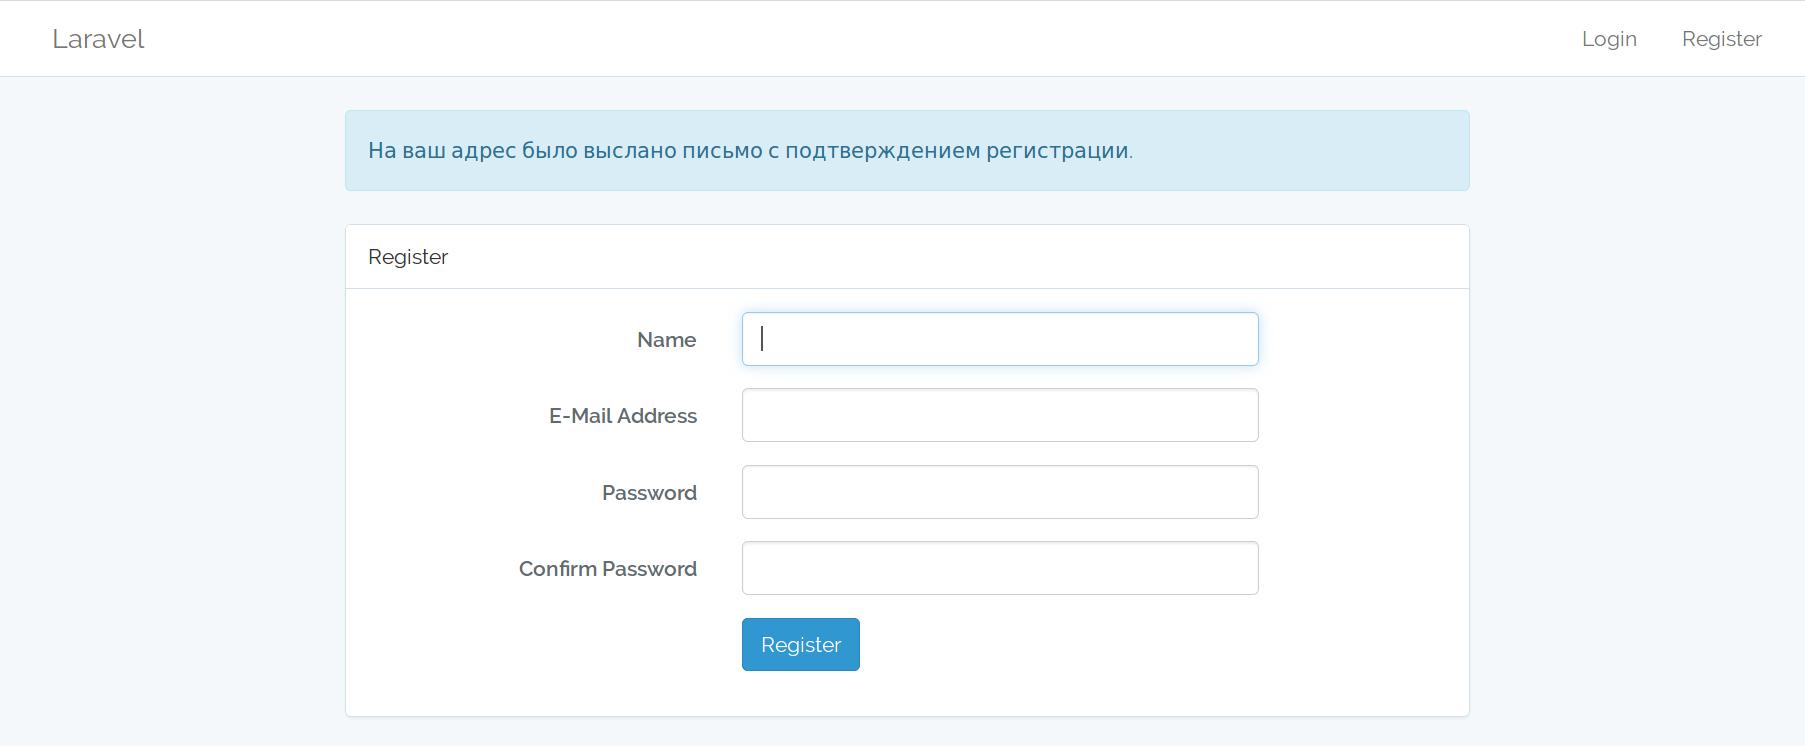 Try These Email Validation Laravel 5 6 {Mahindra Racing}